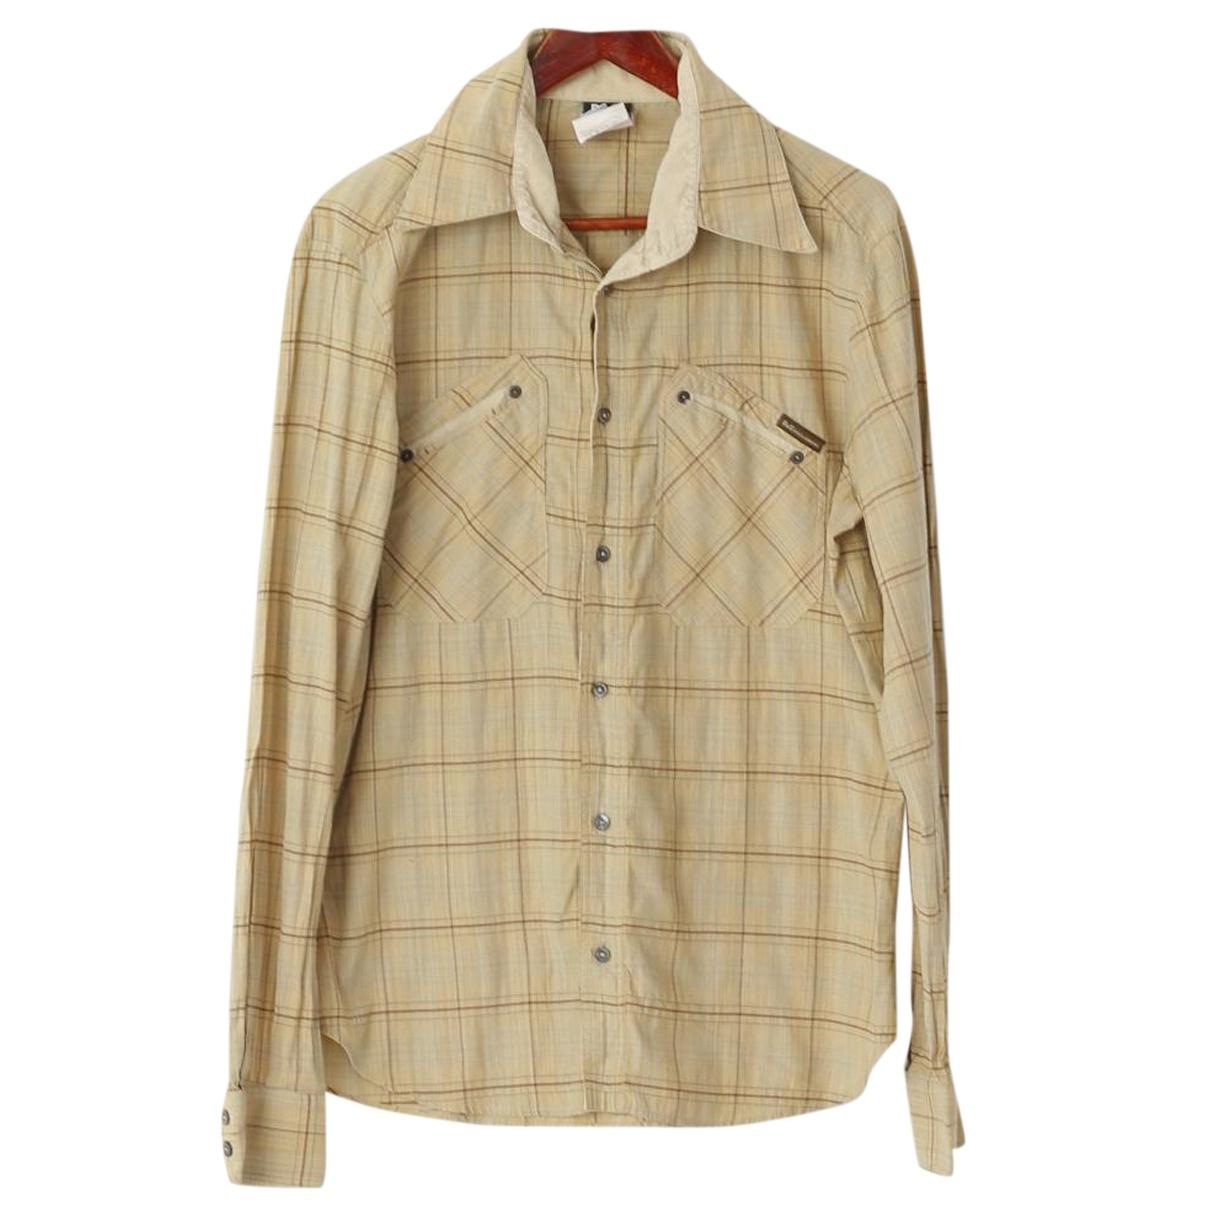 Dolce & Gabbana N Beige Cotton Shirts for Men S International